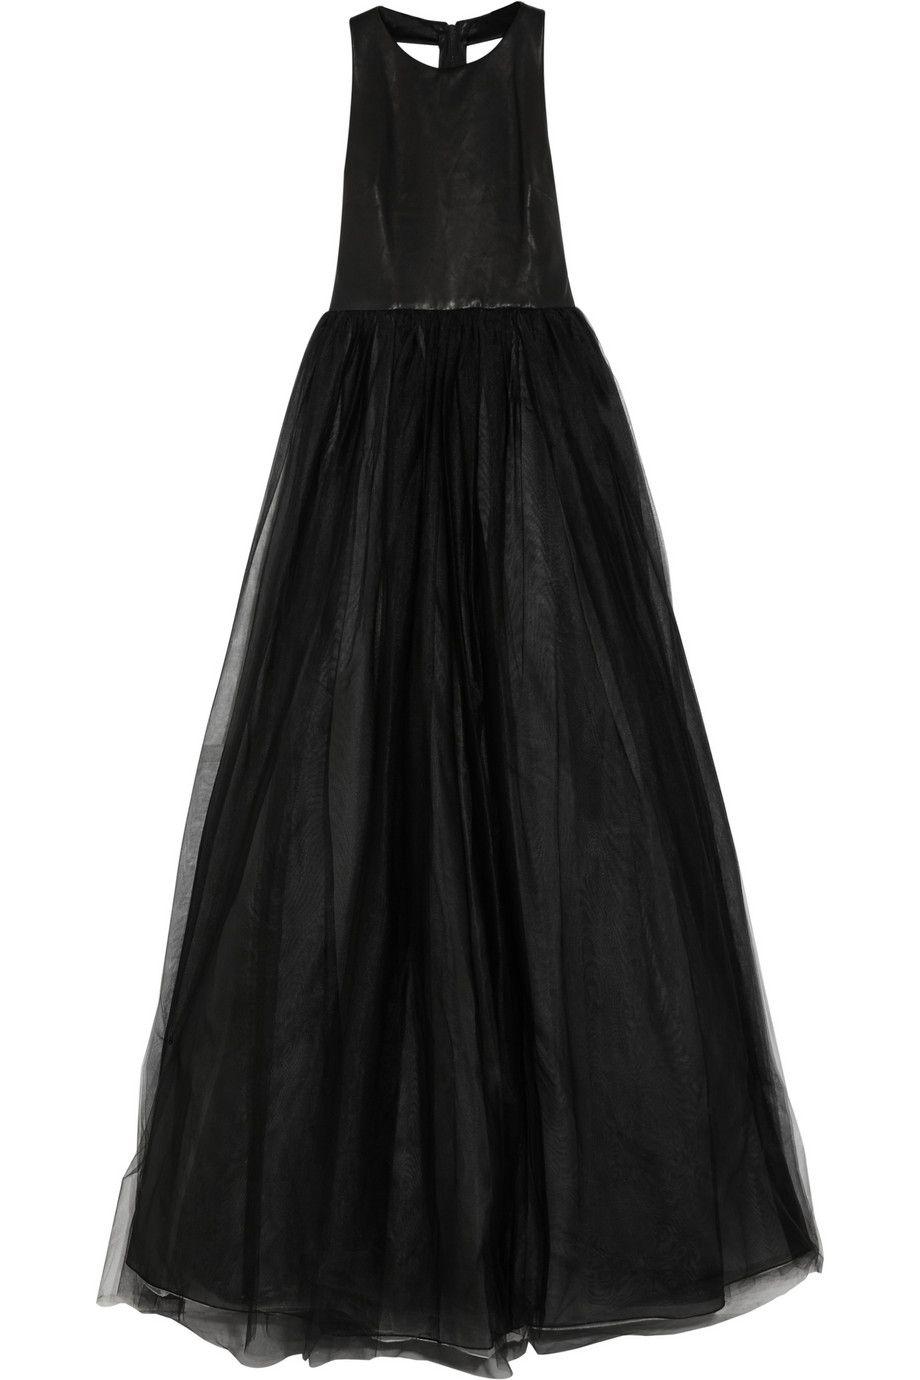 Laice u olivia dress ideas for dipdye fabric pinterest dip